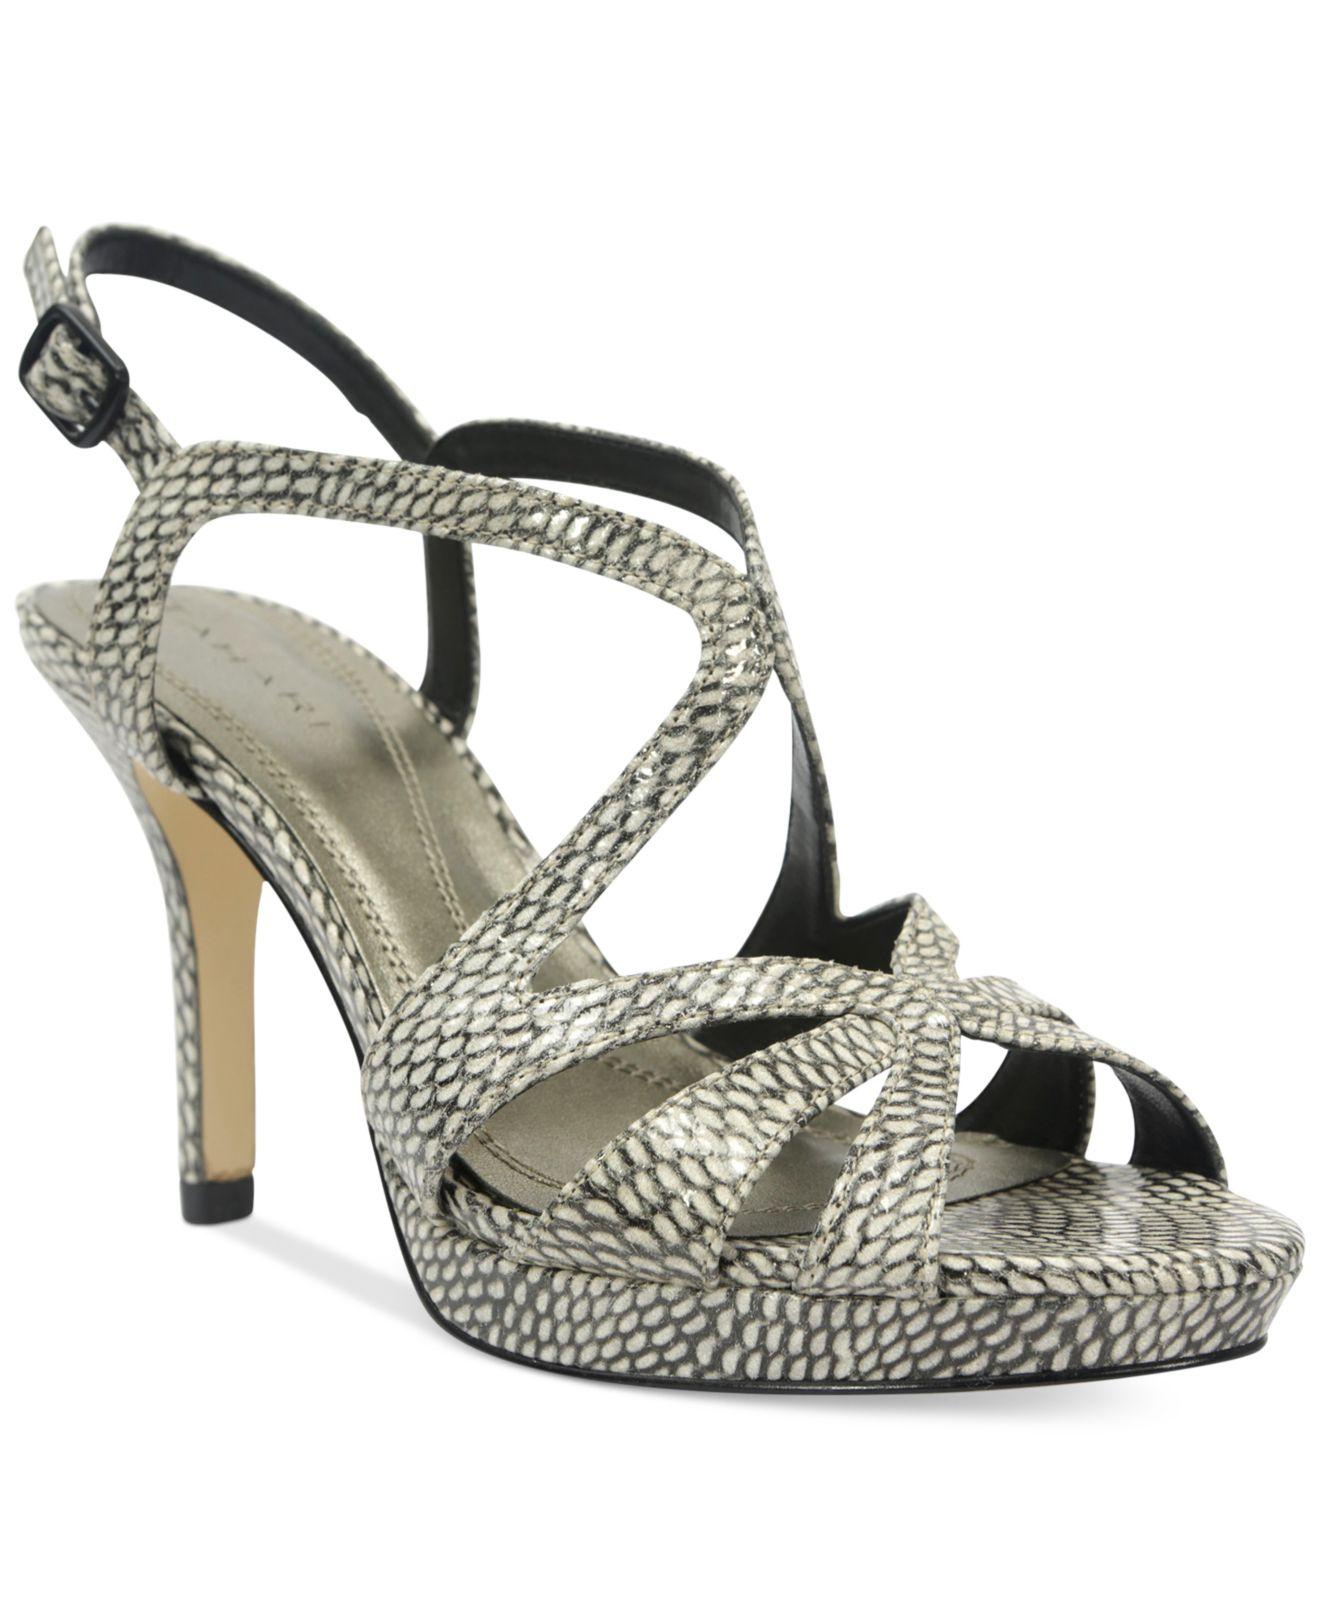 tahari balthasar platform dress sandals lyst